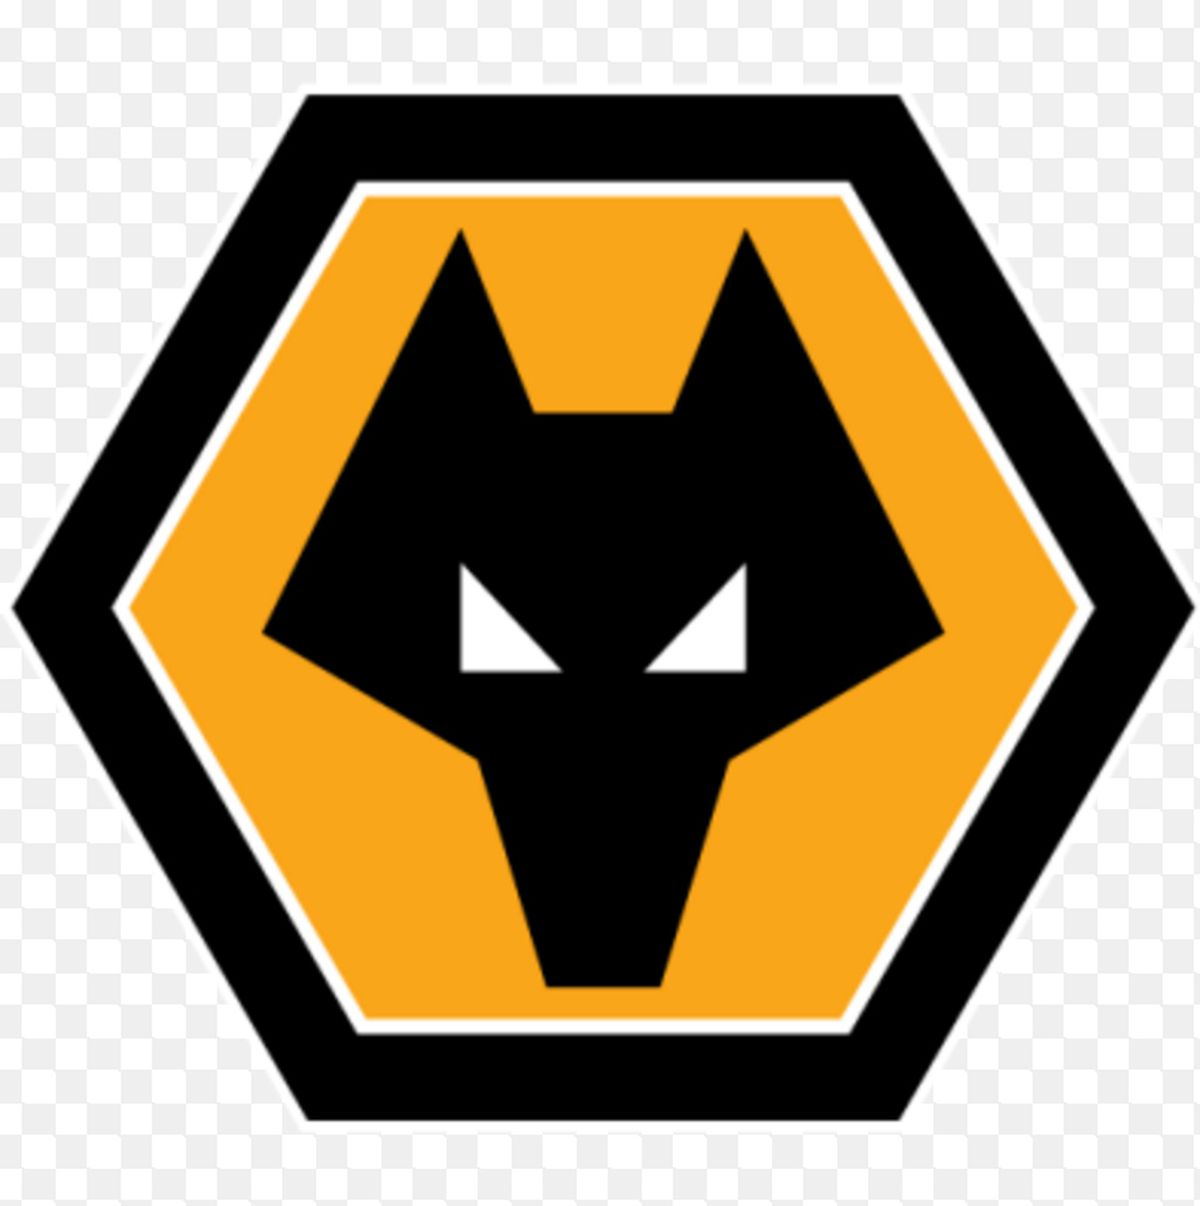 The Wolves logo